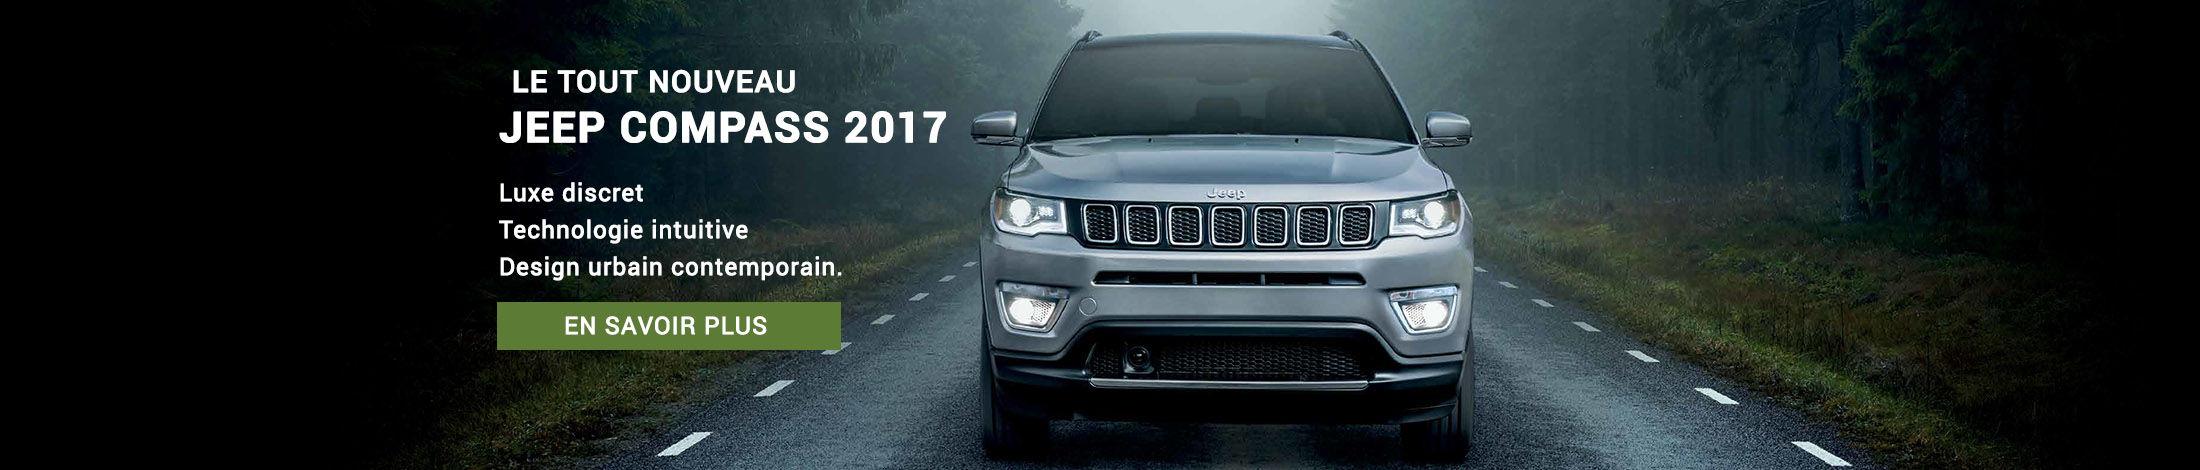 Header Jeep Compass 2017